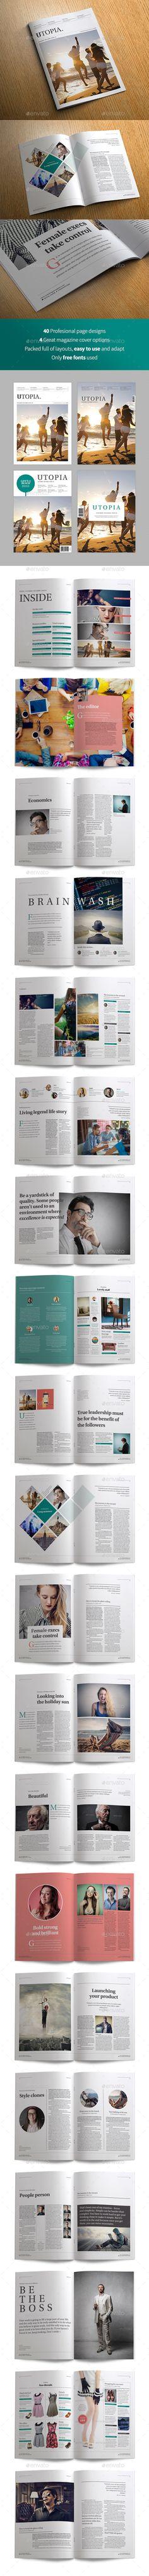 Utopia Magazine  #interview #layouts #magazine #$18